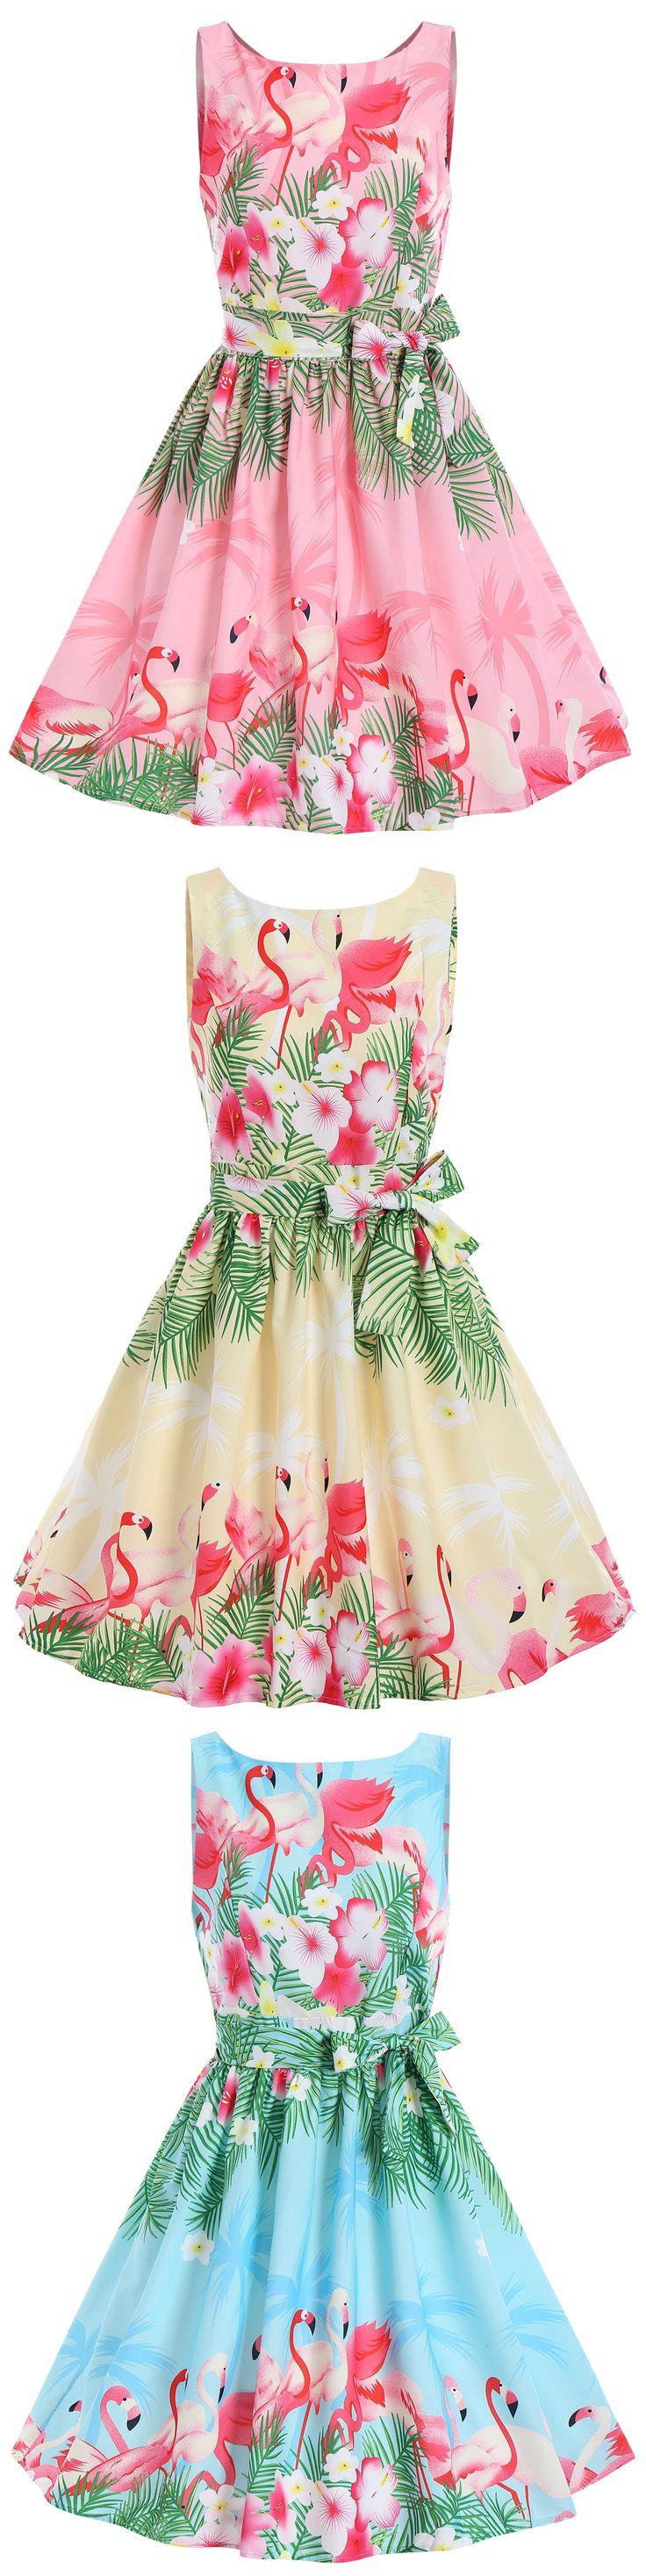 Swan Print Summer A Line Vintage Dress